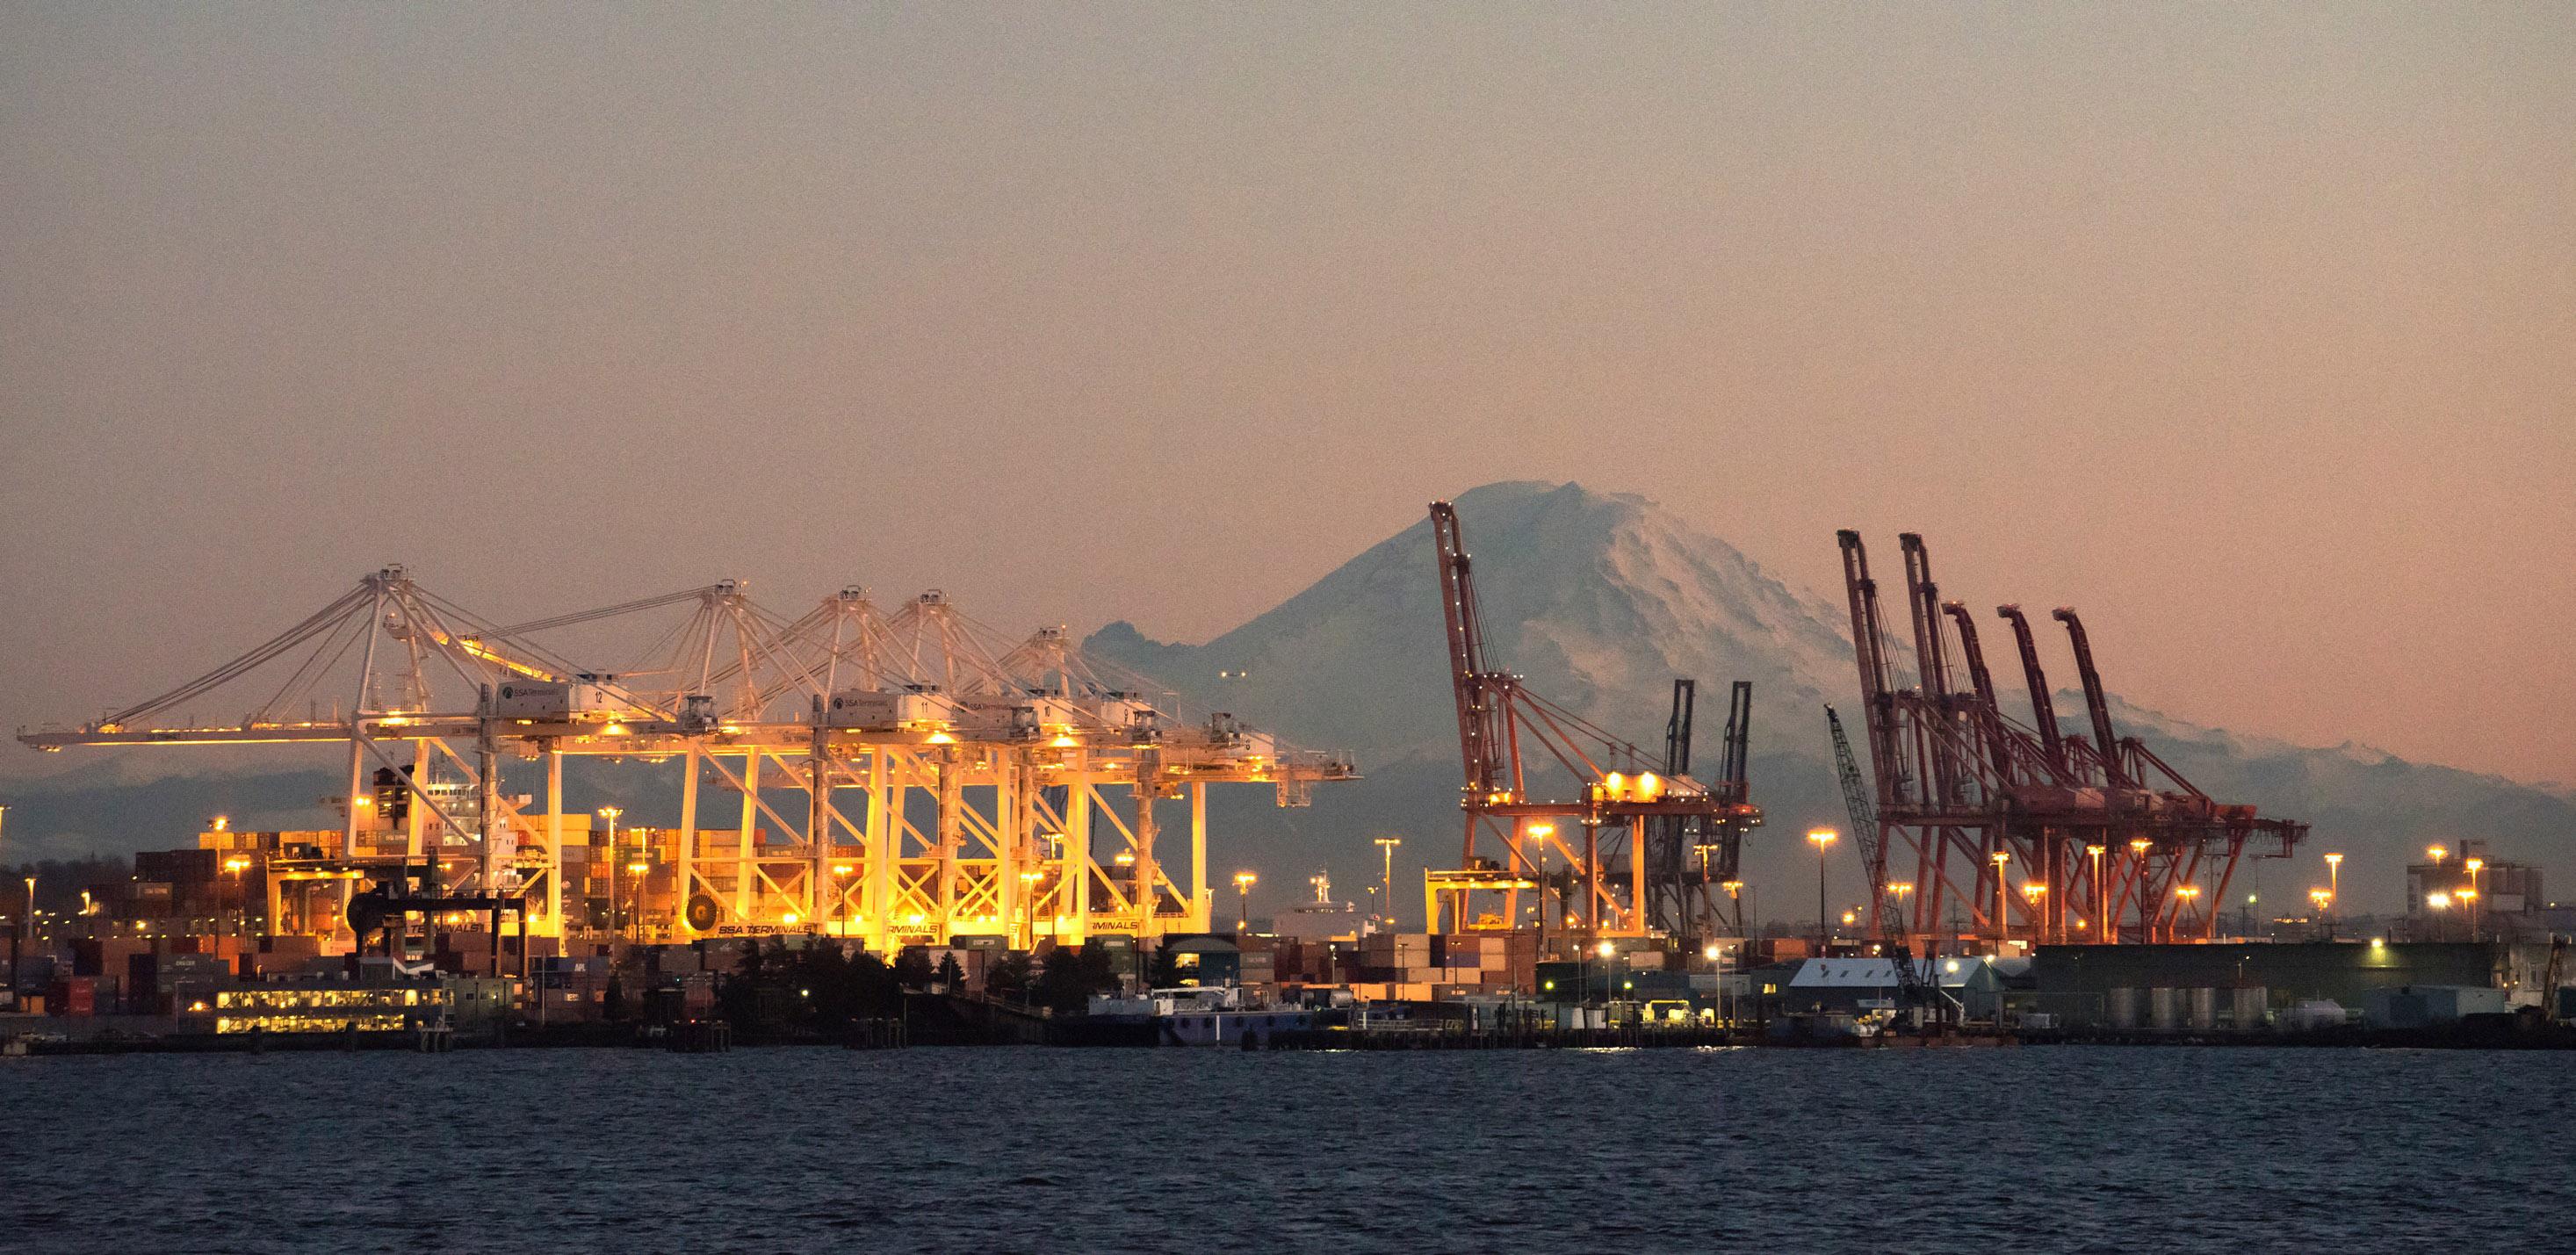 Mount Rainier and container cranes